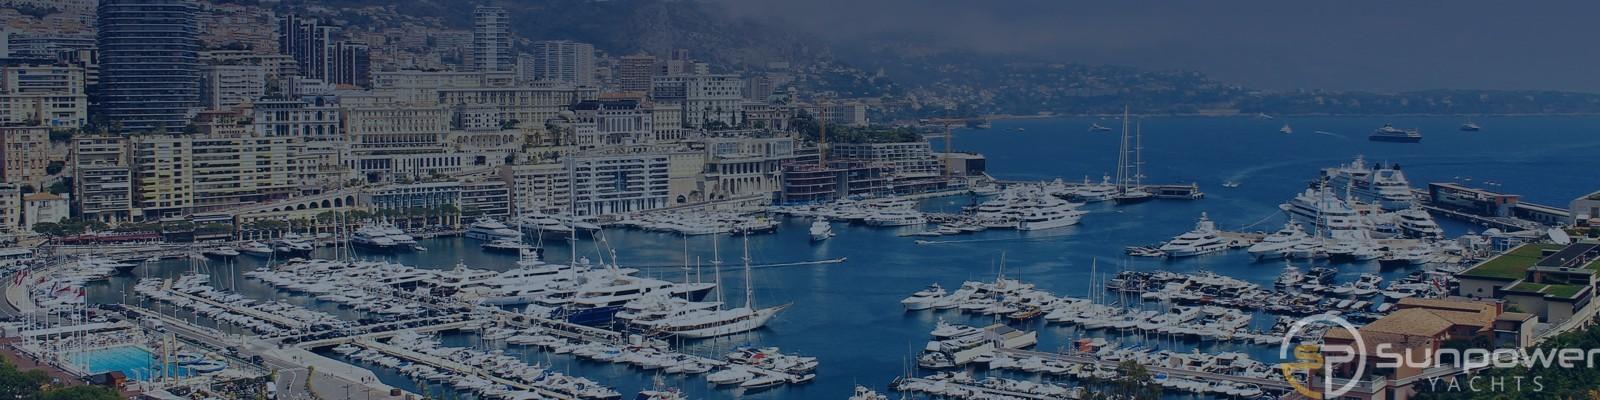 Contact Monaco